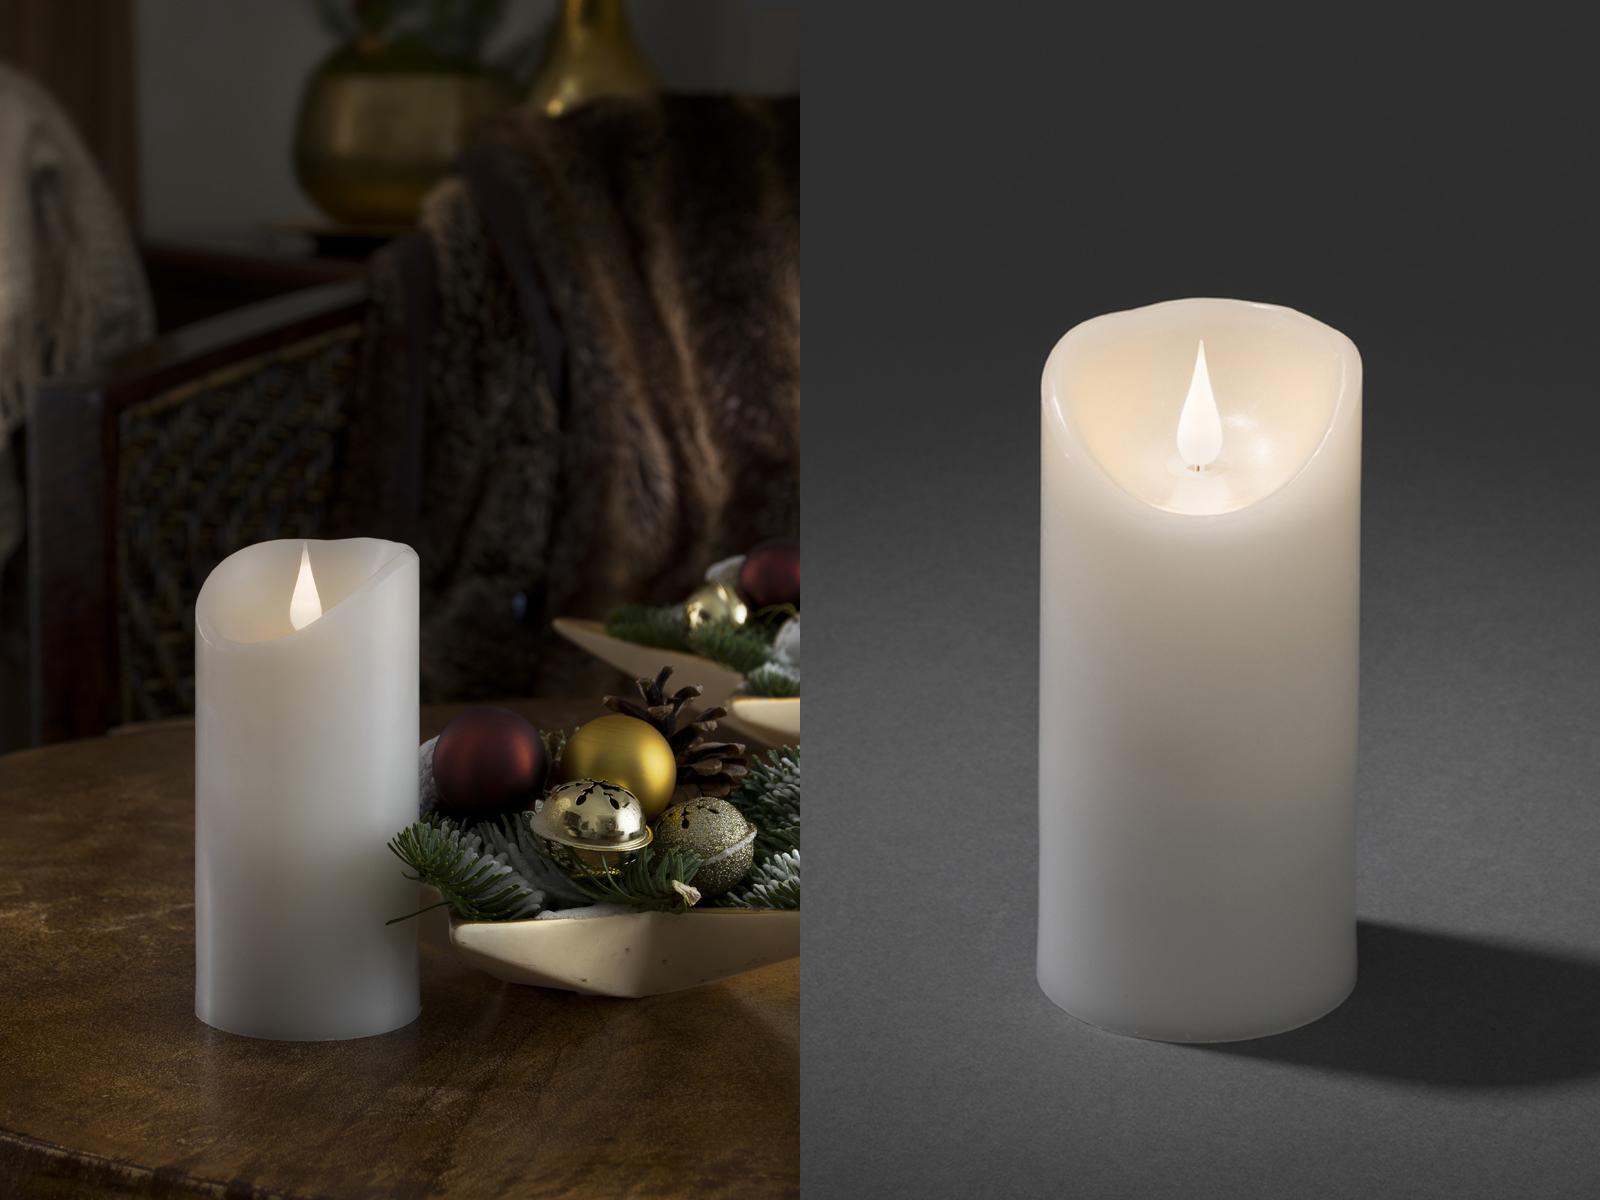 led kerze mit timer h 15 5cm echtwachskerze flackerlicht. Black Bedroom Furniture Sets. Home Design Ideas